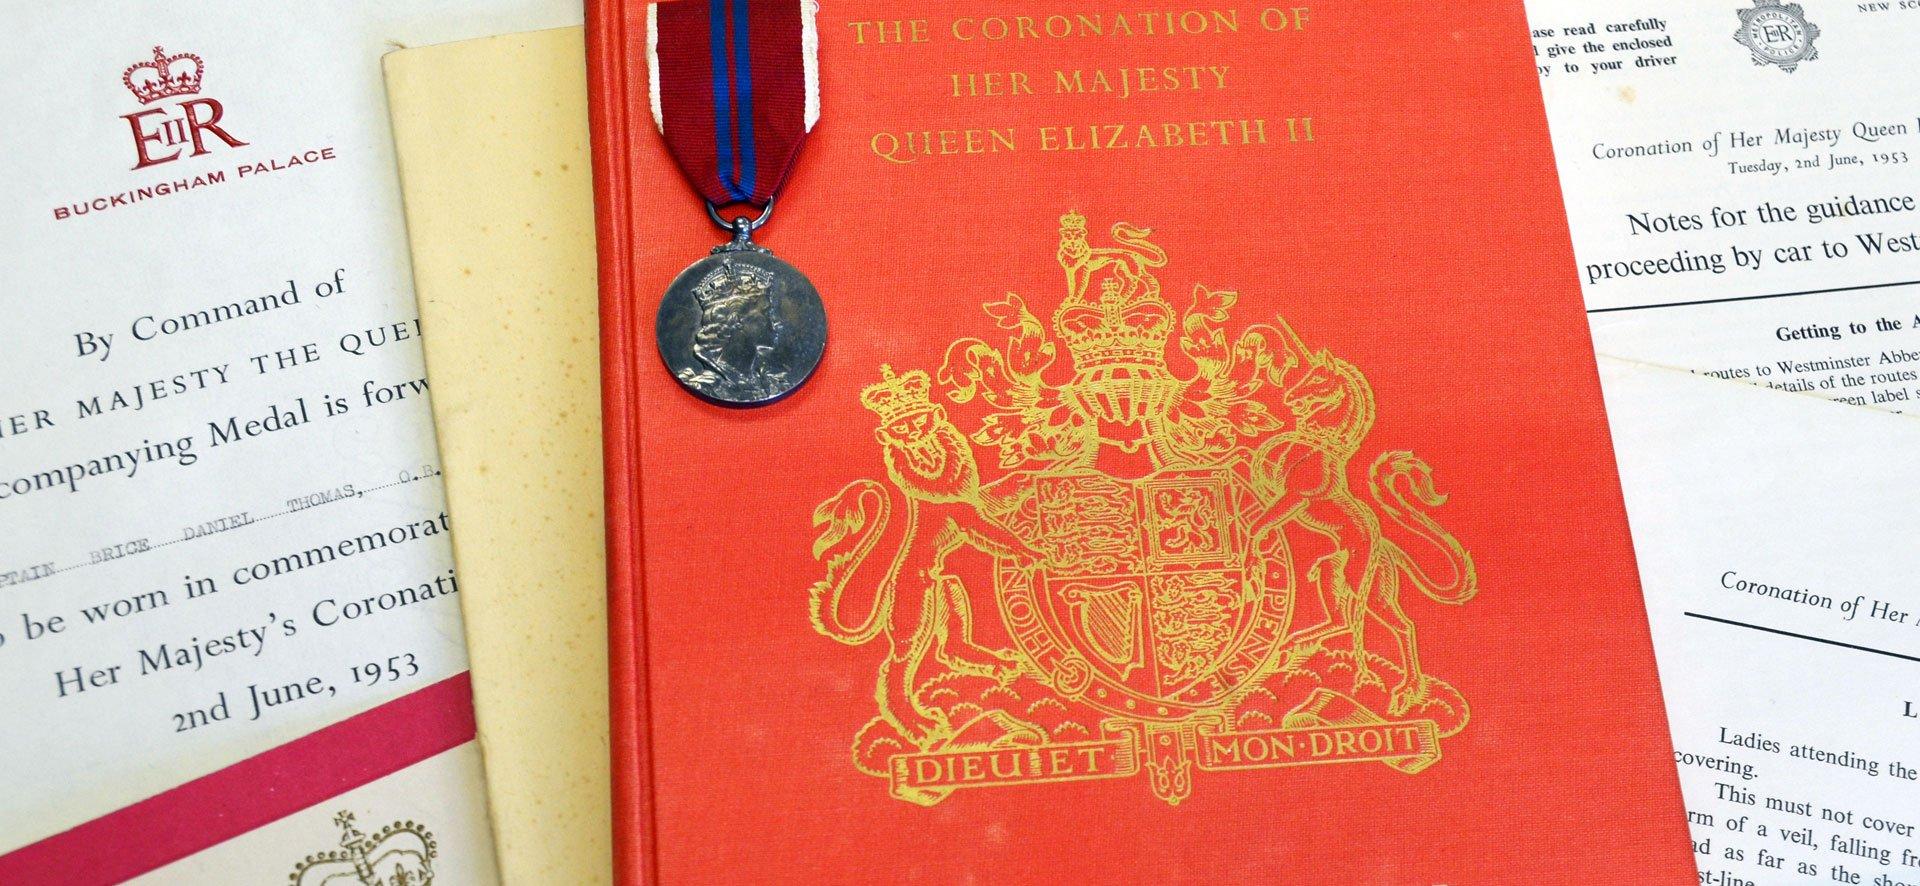 Coronation document